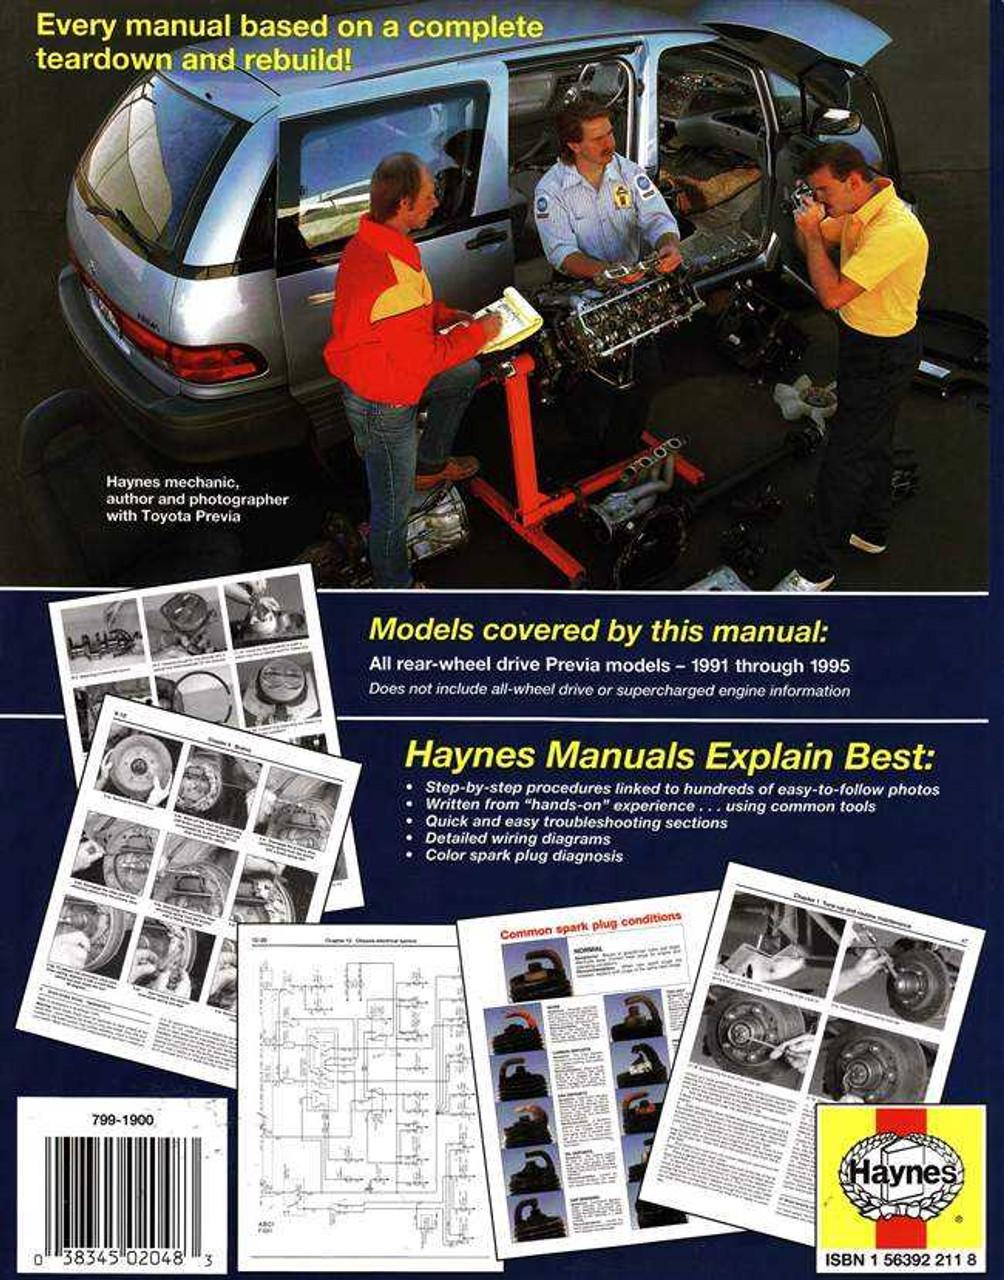 Sensational Toyota Tarago Previa 1991 1995 Workshop Manual Wiring 101 Capemaxxcnl